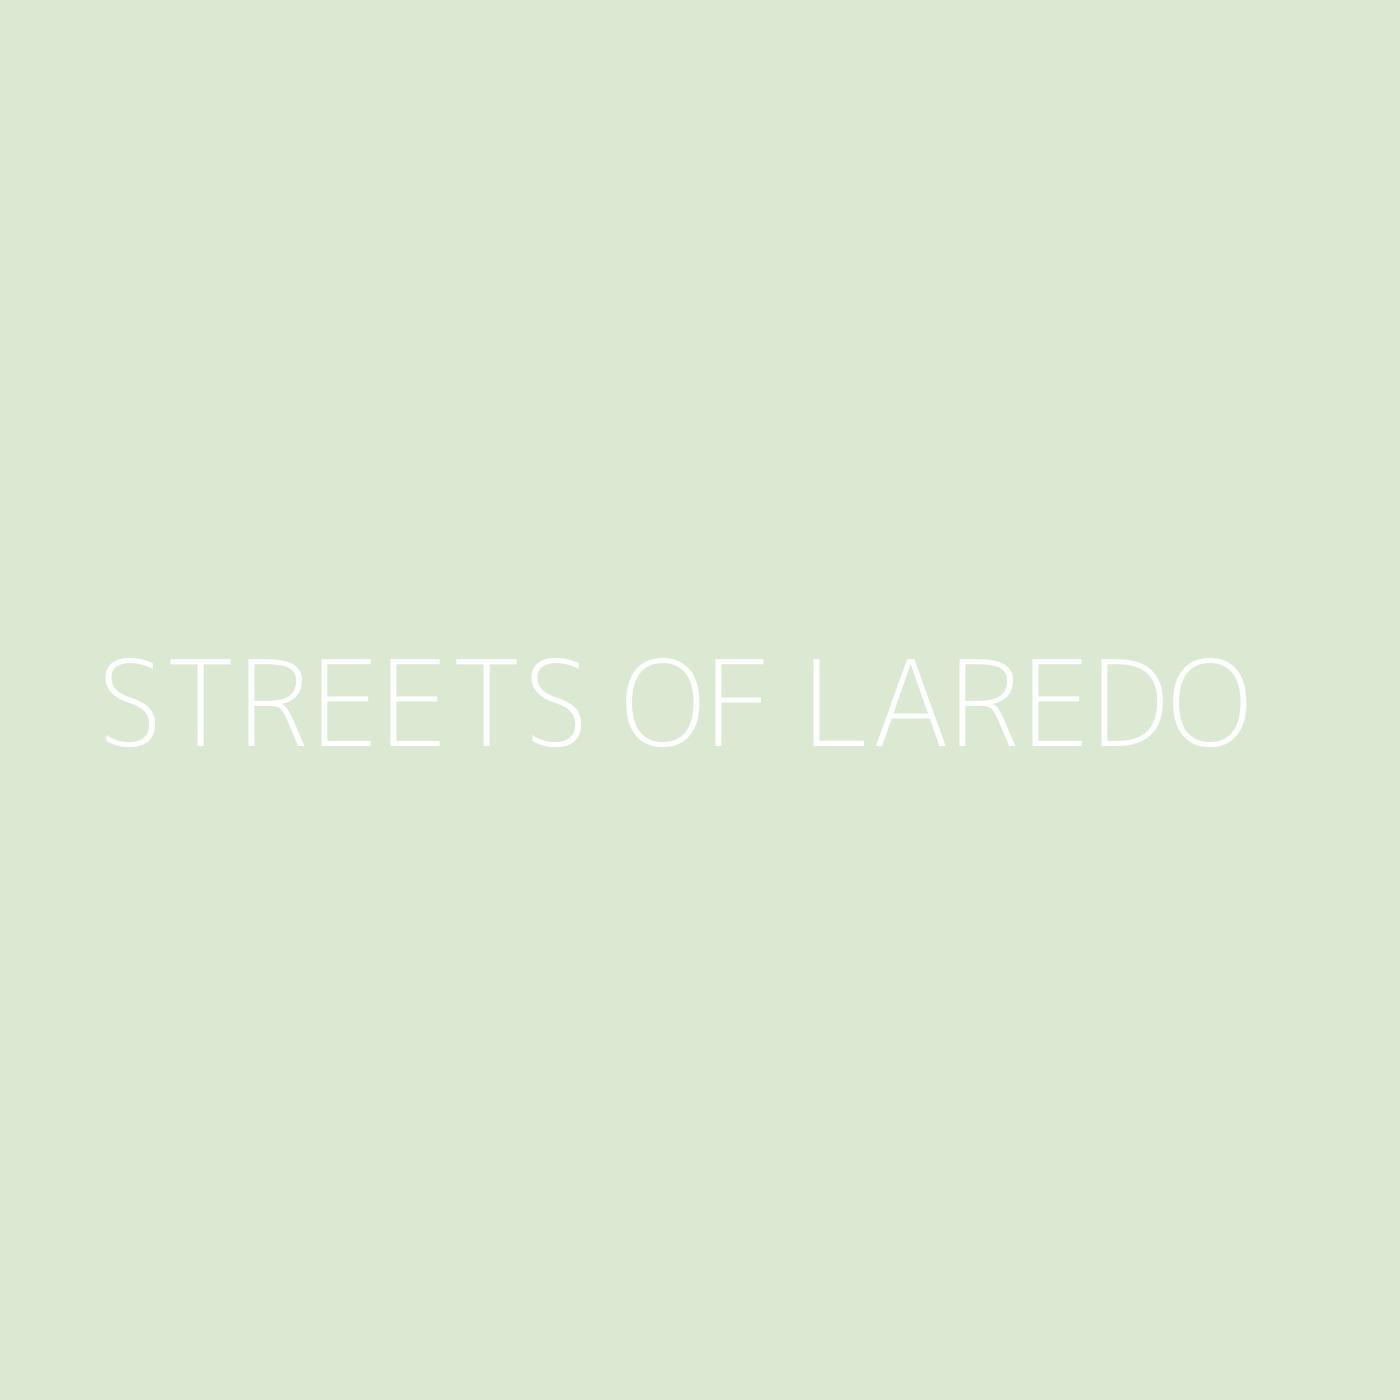 Streets of Laredo Playlist Artwork